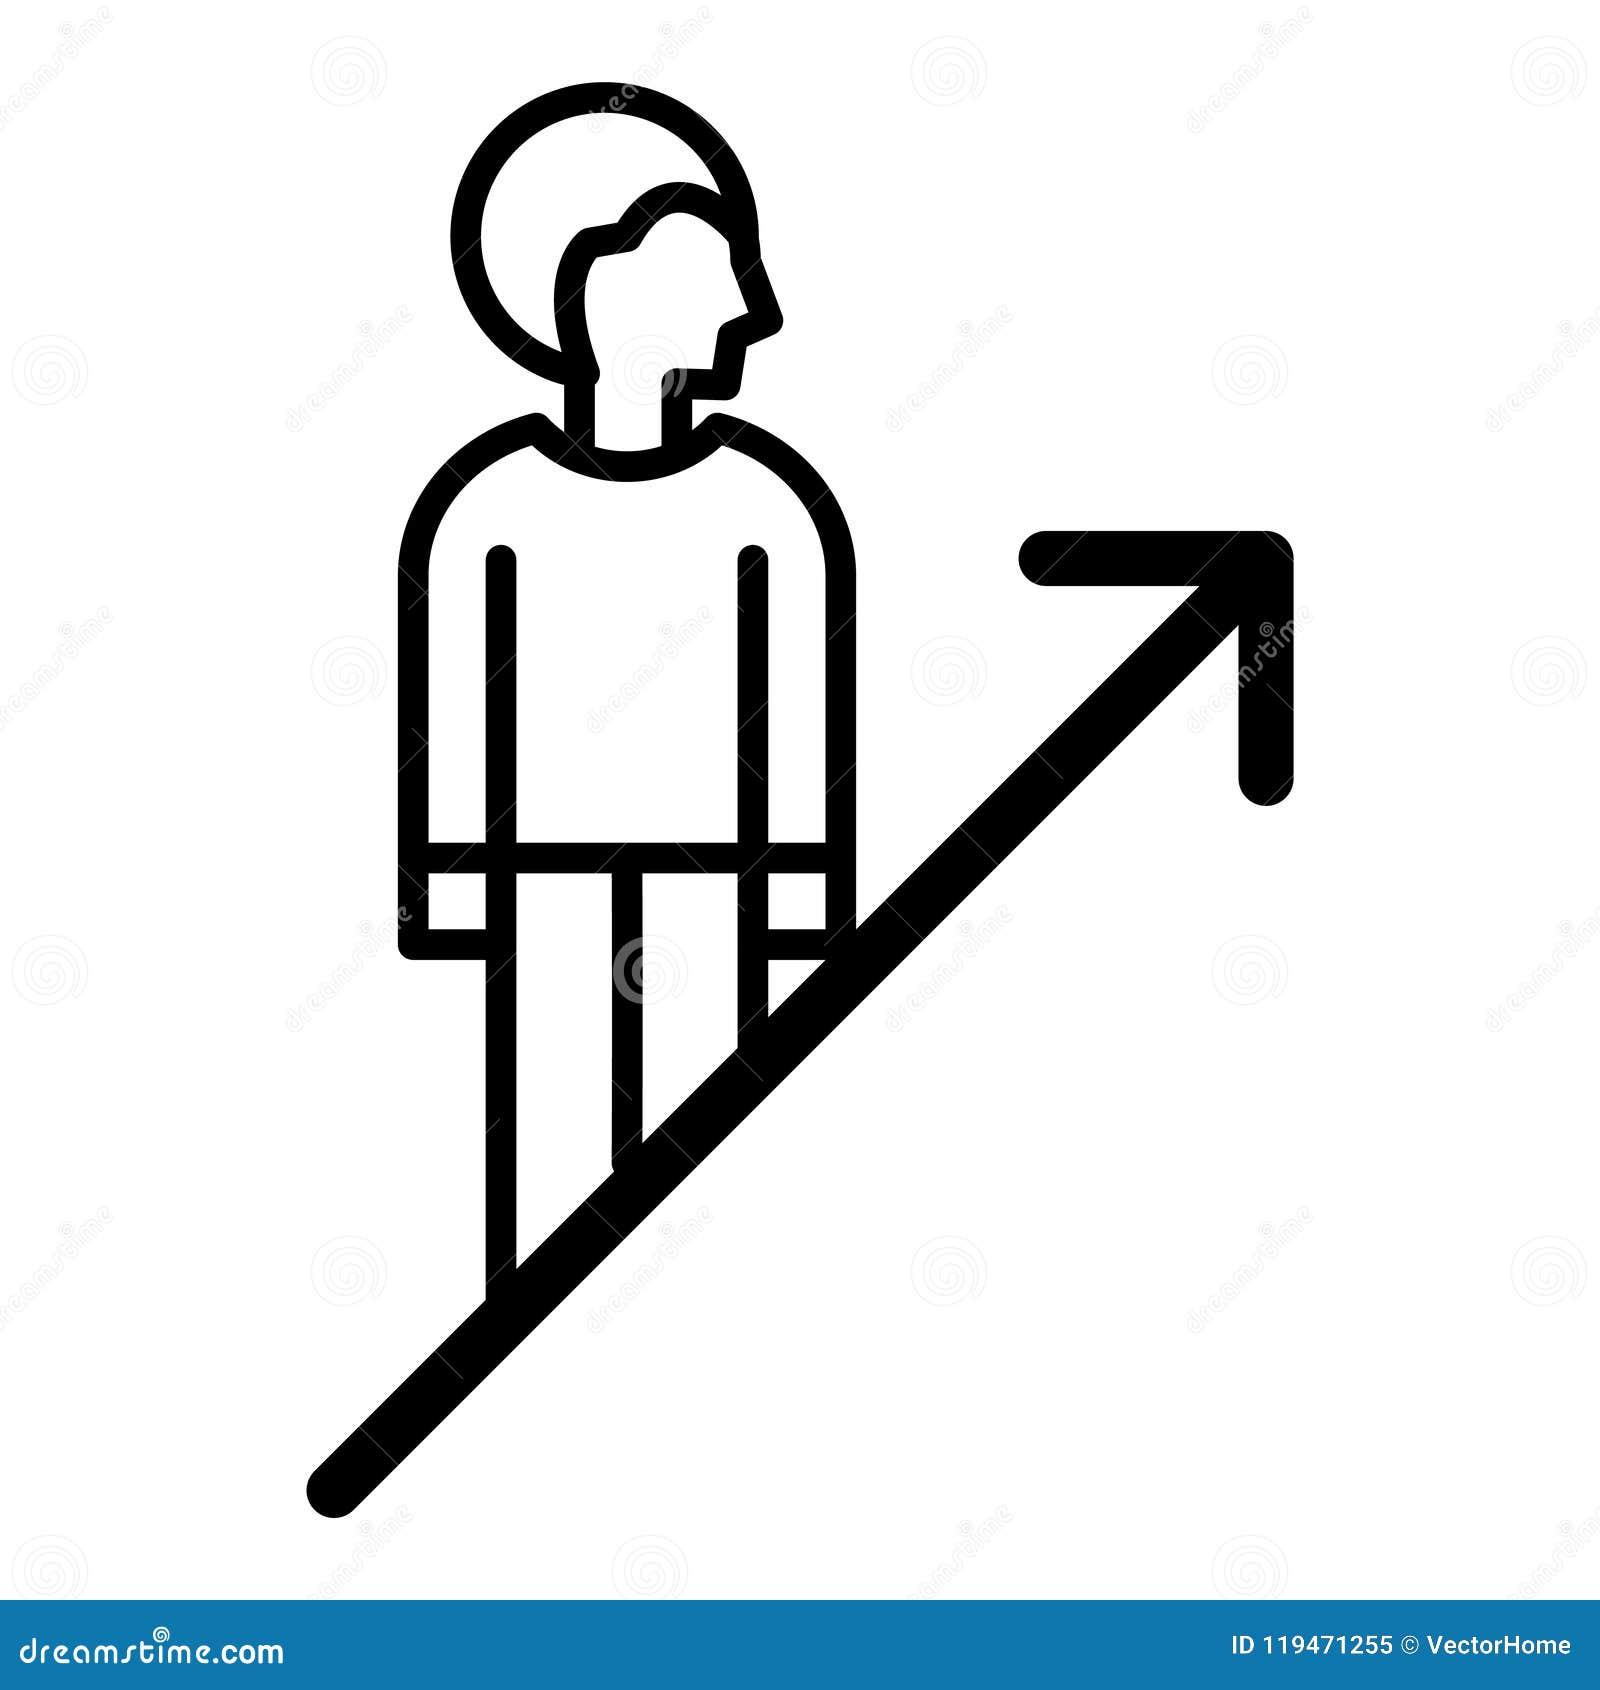 self improvement icon stock vector illustration of potential